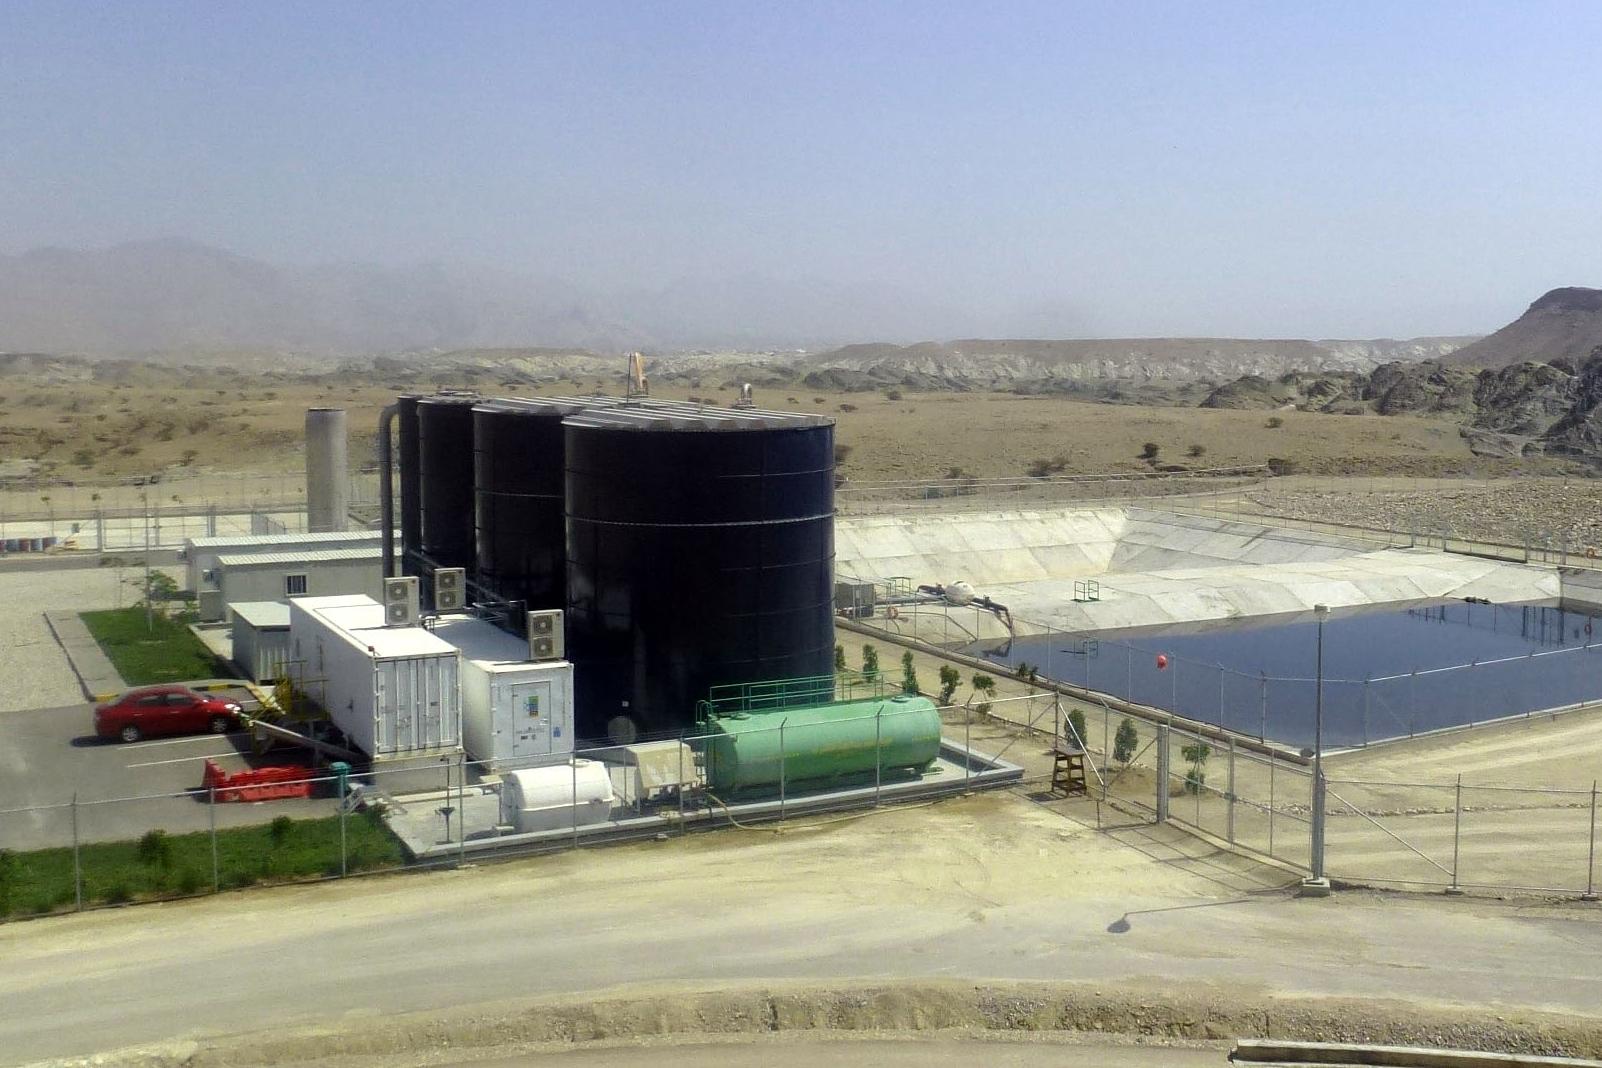 landfill leachate treatment plant - LTP Al Mutaqa, Oman - BIOMEMBRAT<sup>®</sup> - WEHRLE